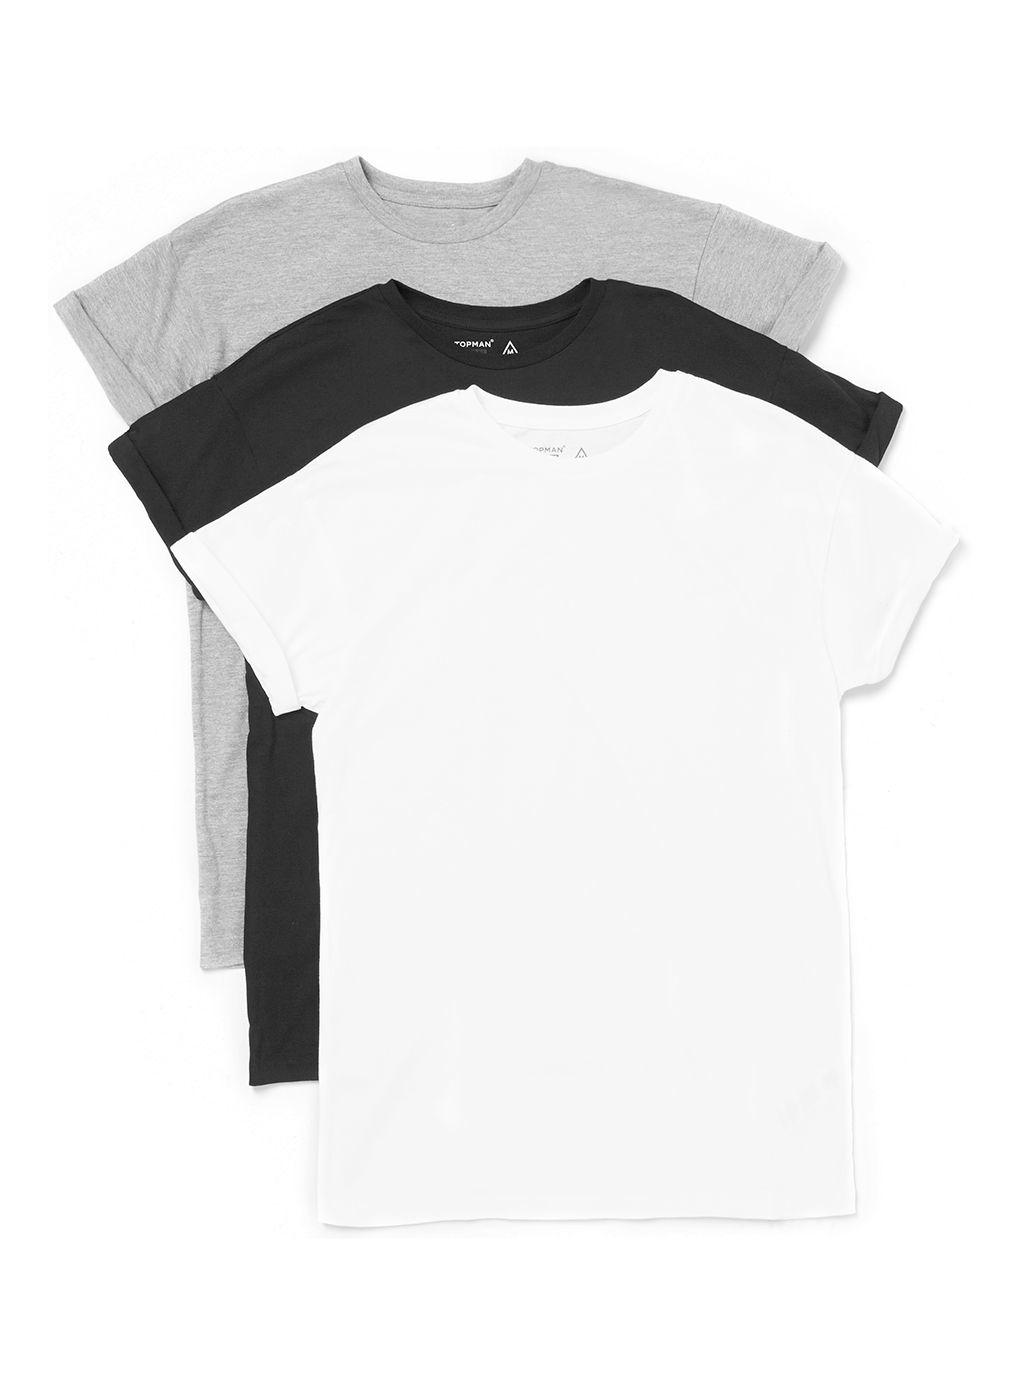 Black t shirt topman - Black T Shirt Topman Gallery